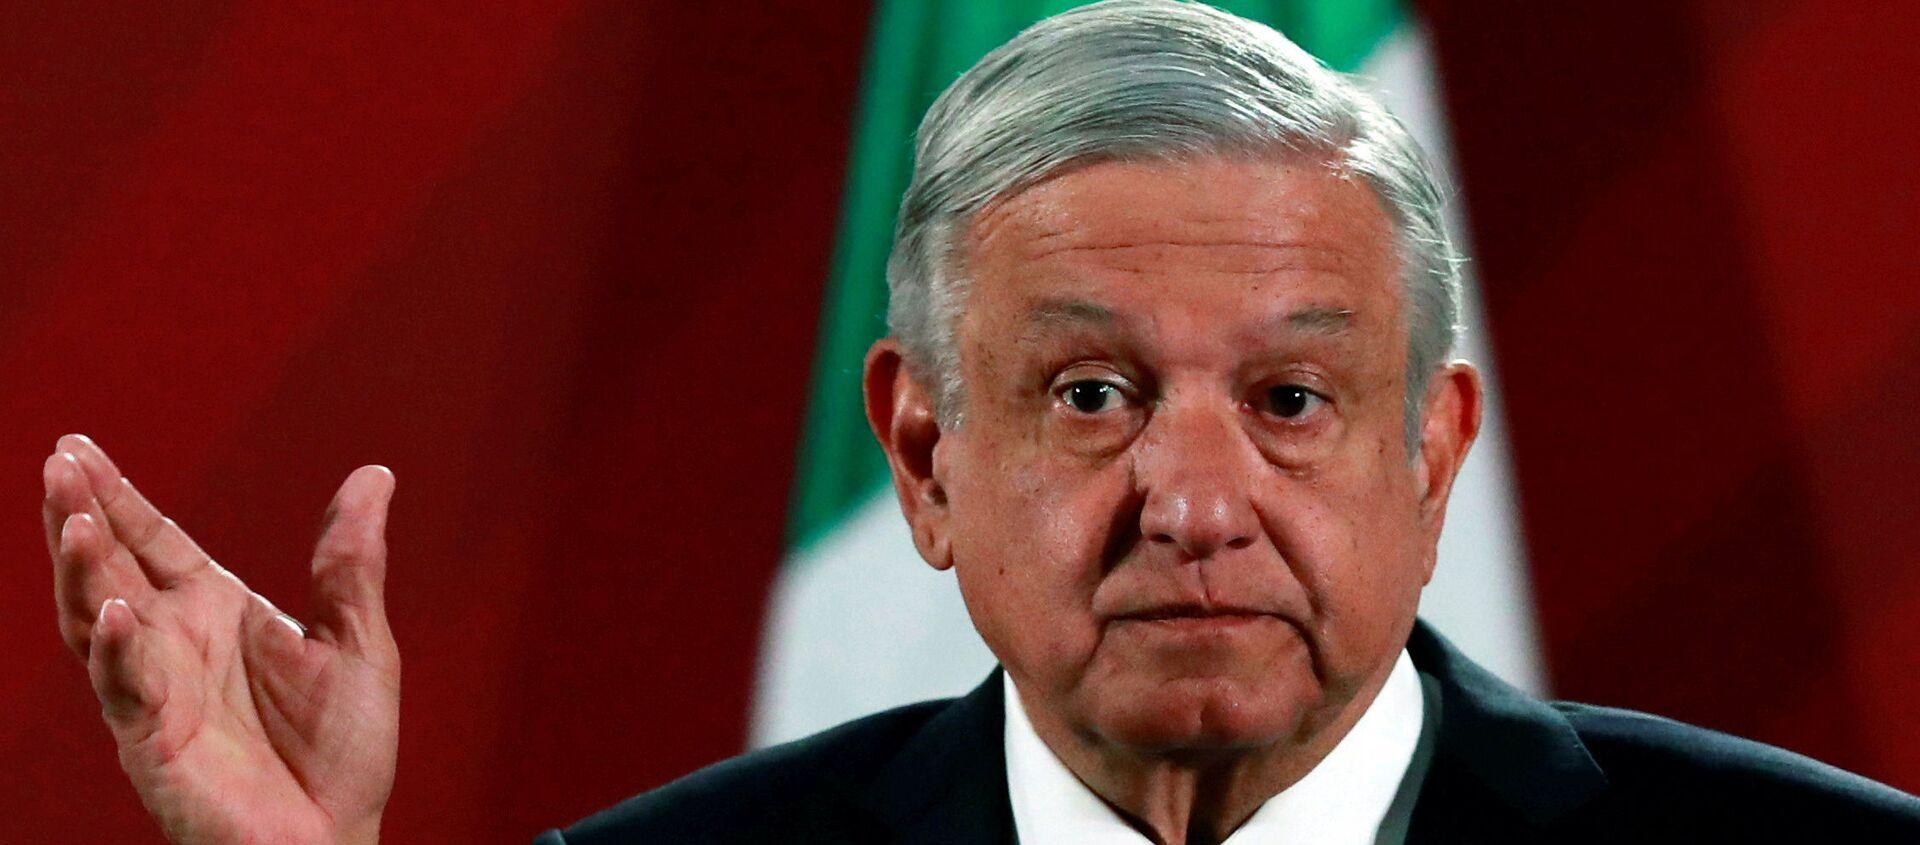 Andrés Manuel López Obrador, presidente mexicano - Sputnik Mundo, 1920, 10.08.2020